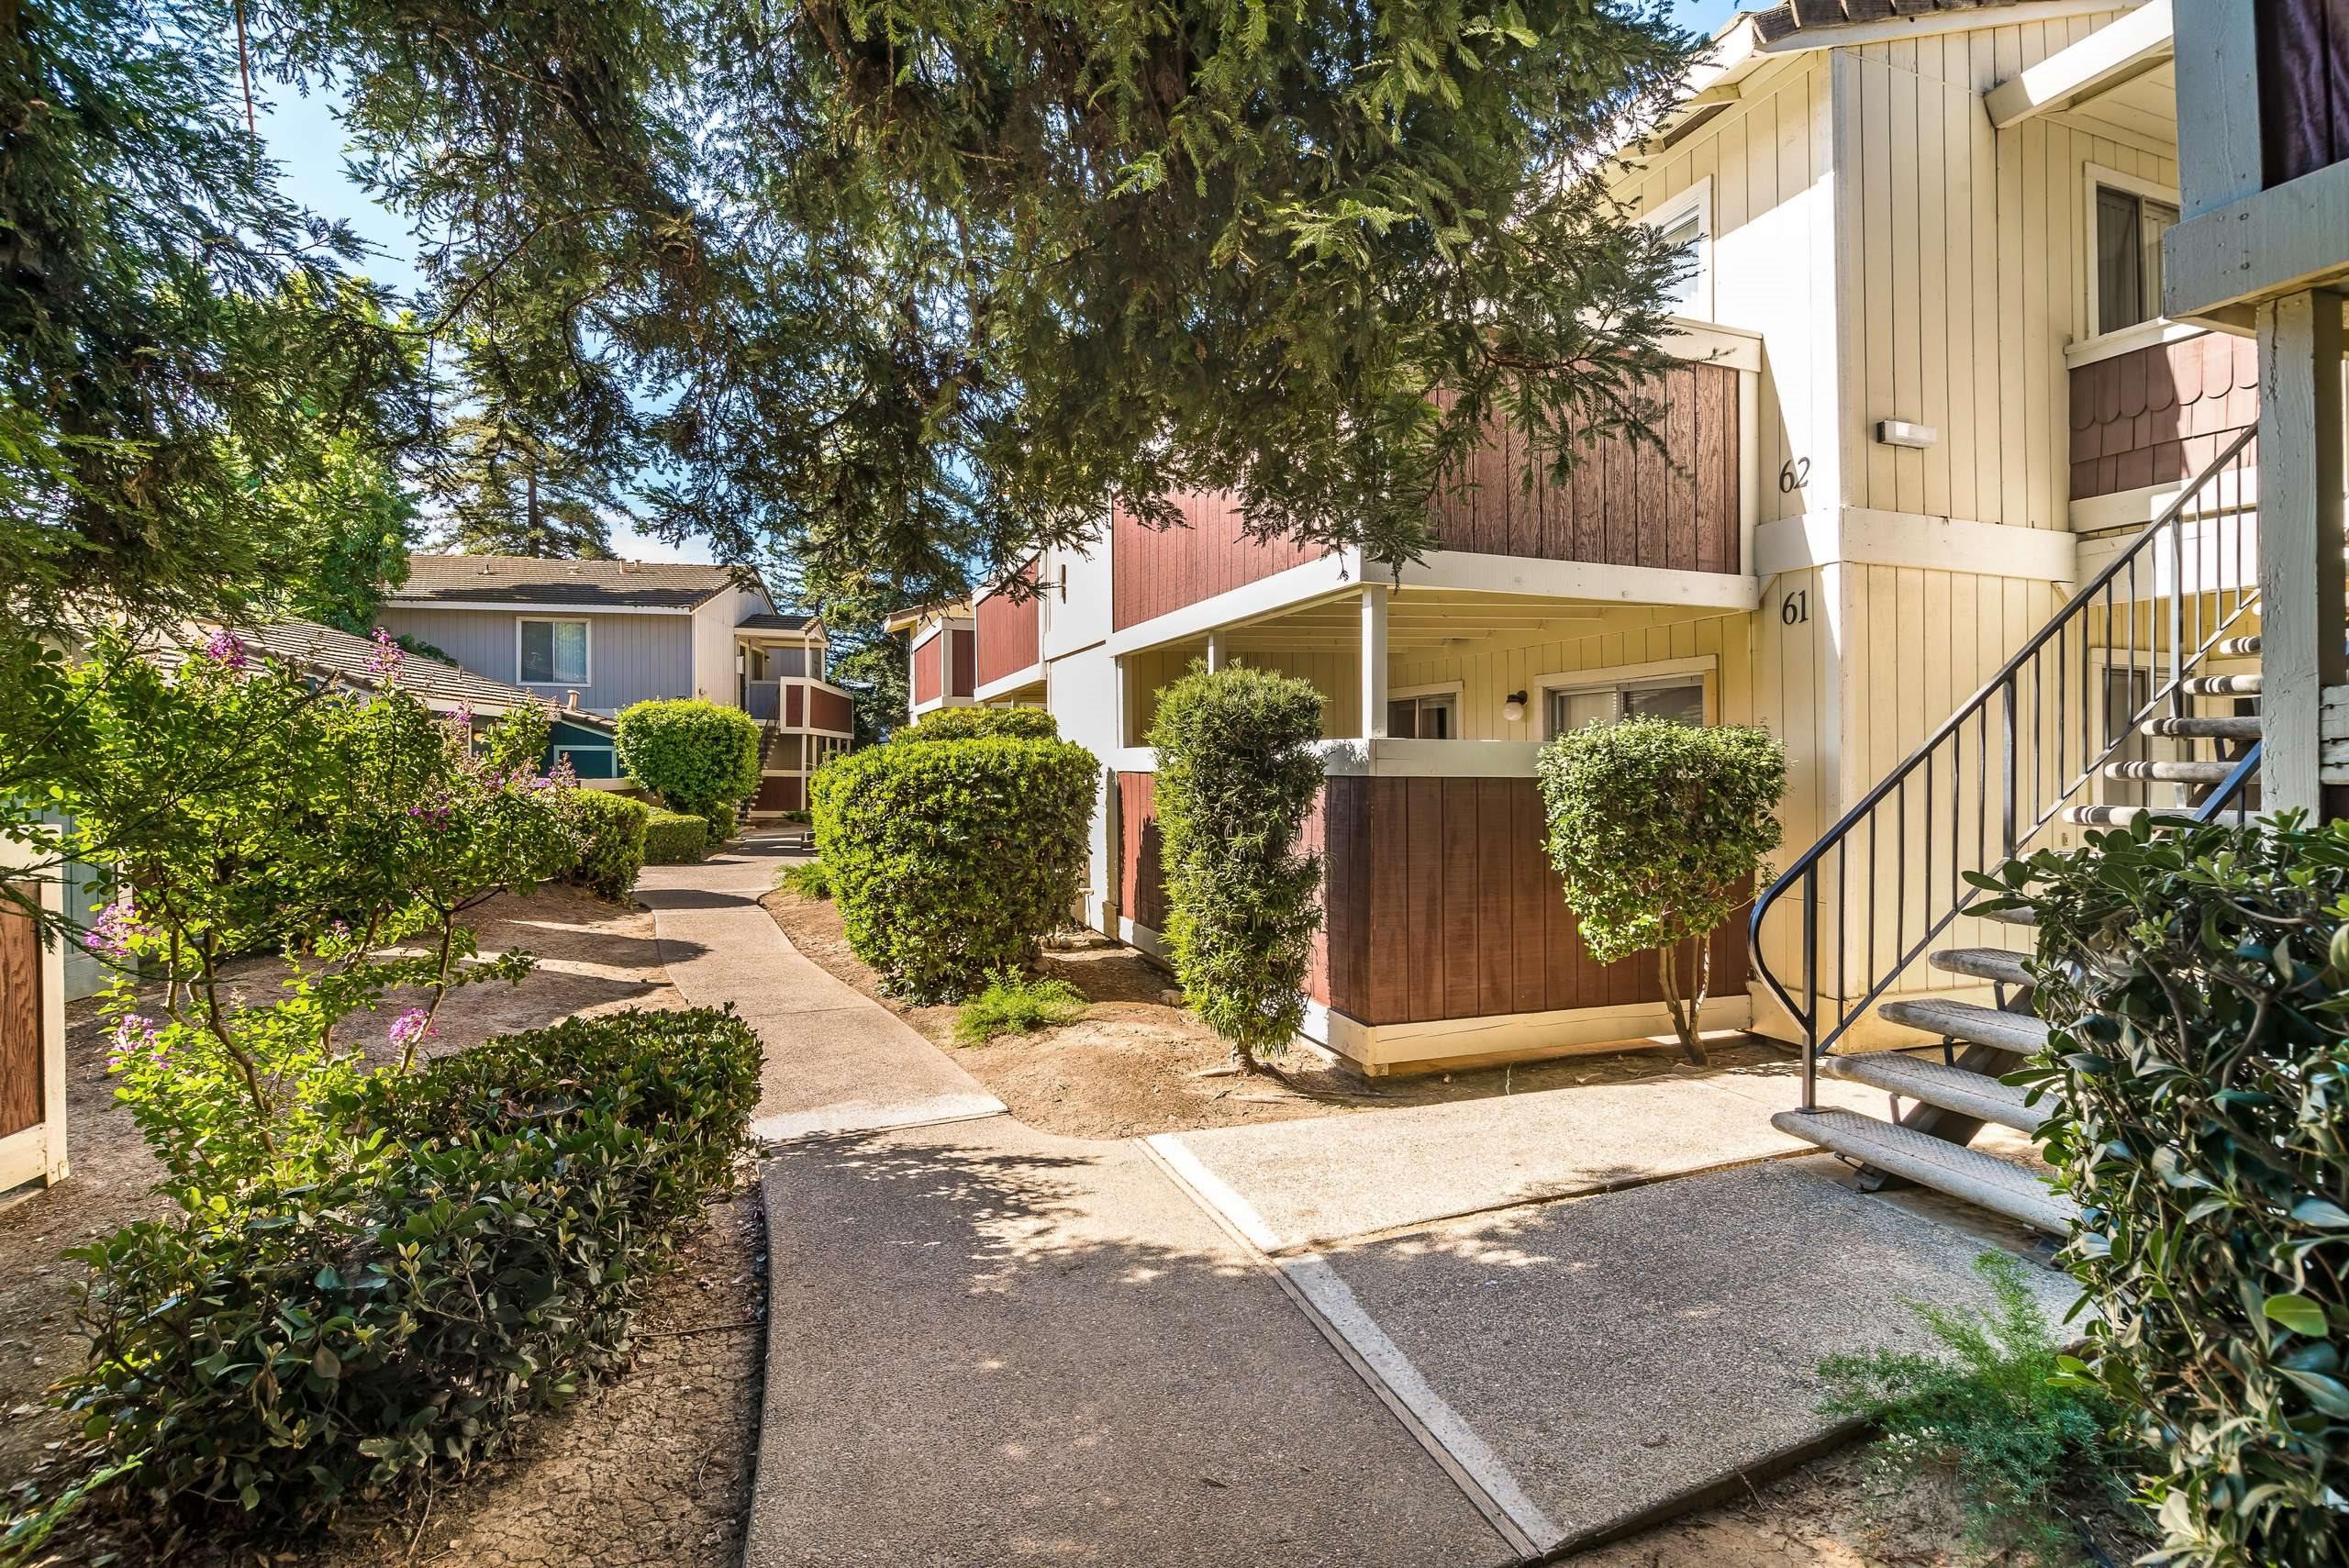 Northwood Village Apartment Home-Sample Image of Merced CA Nurse Housing